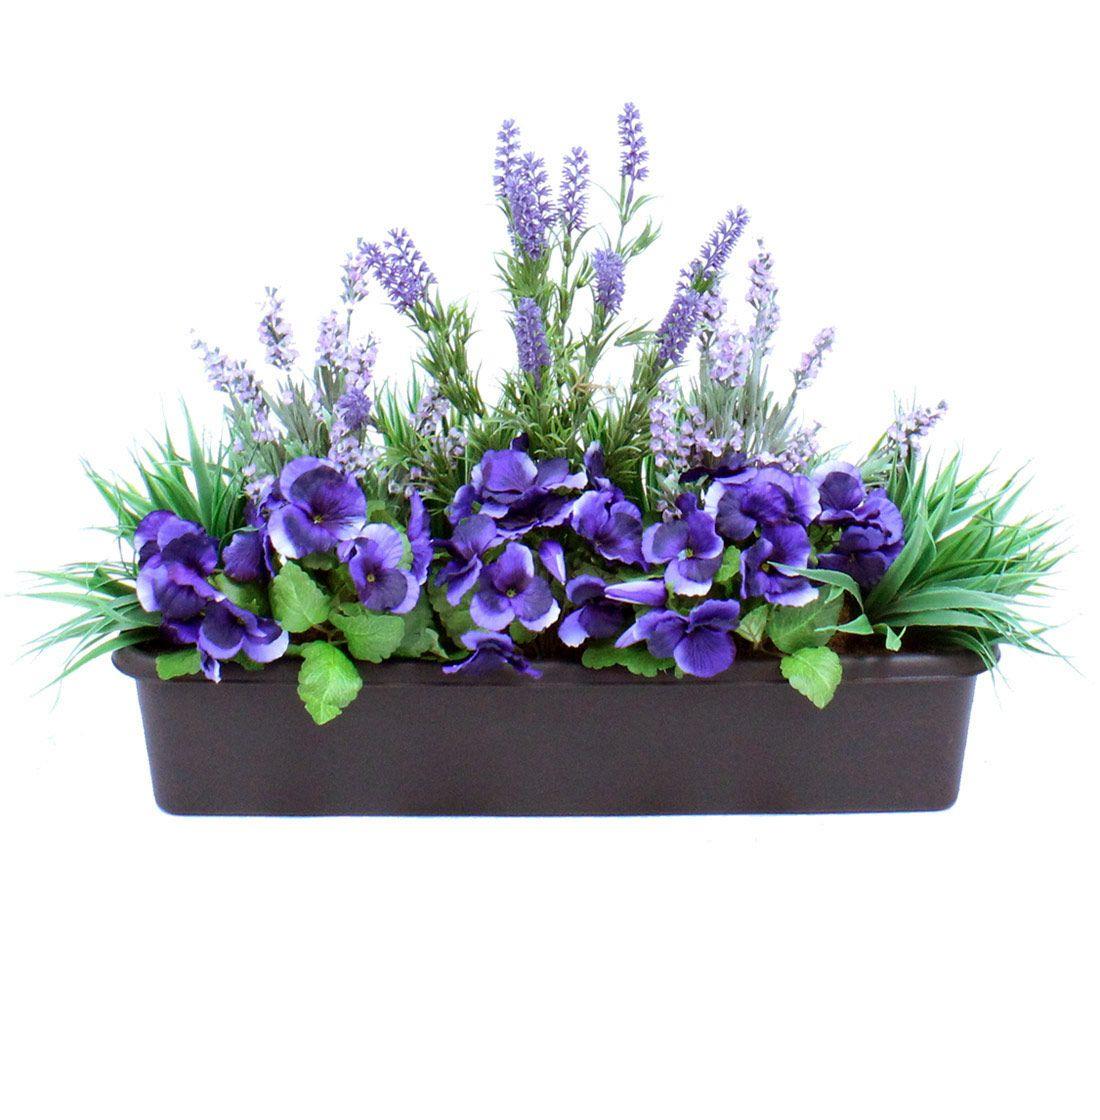 Artificial Lavender Window Box Flowers